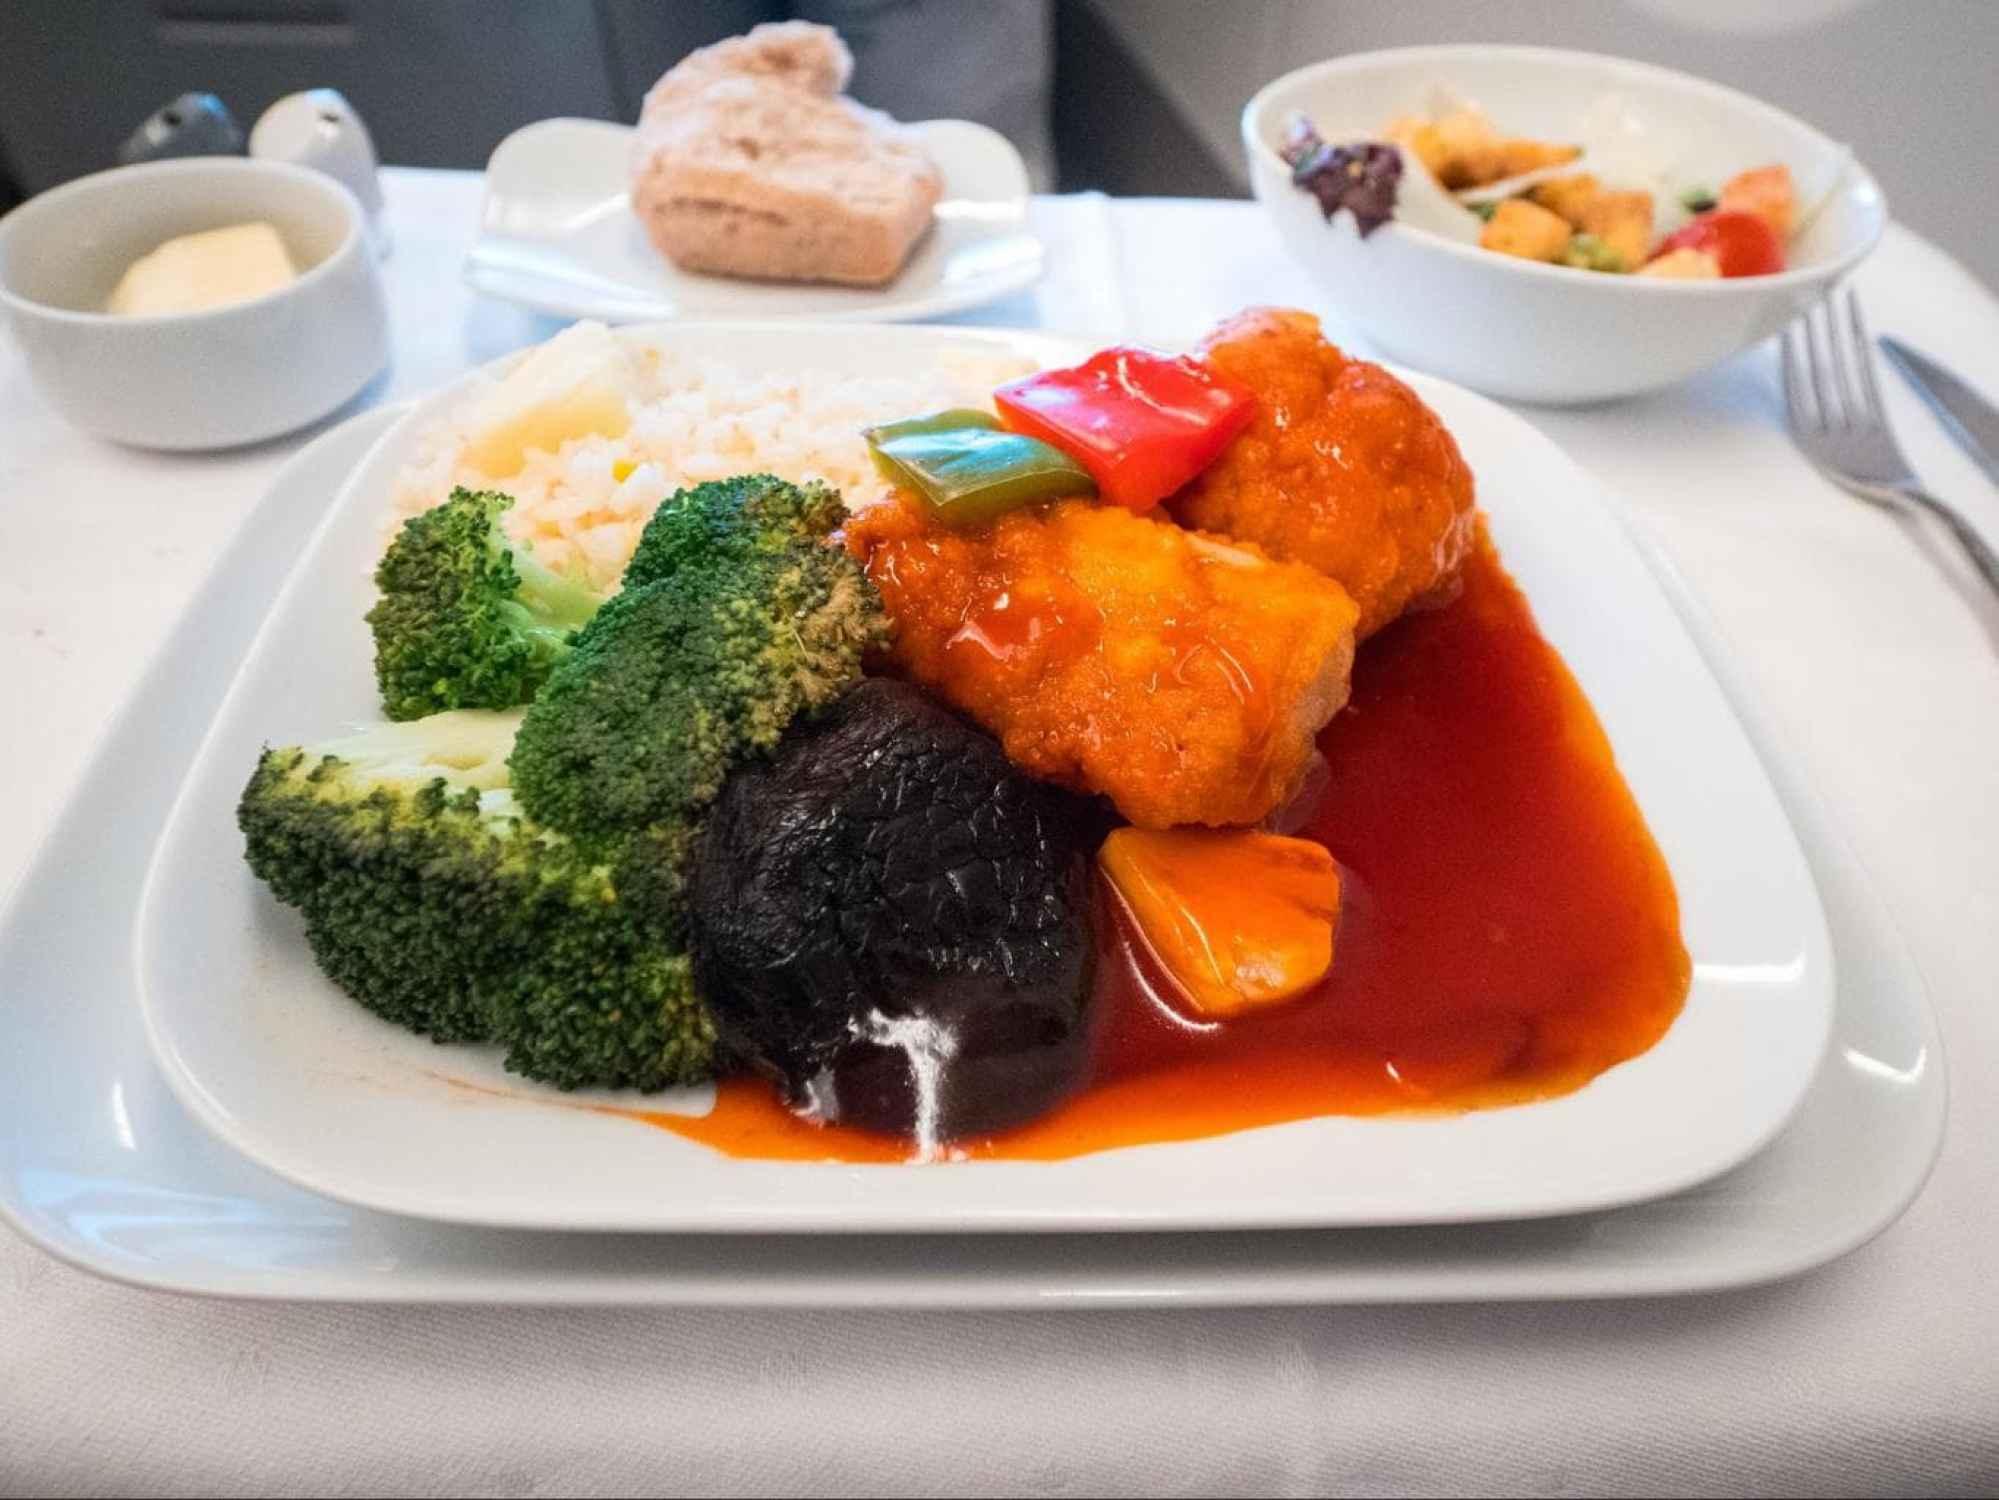 Lufthansa Business Class food - Sweet and sour garoupa